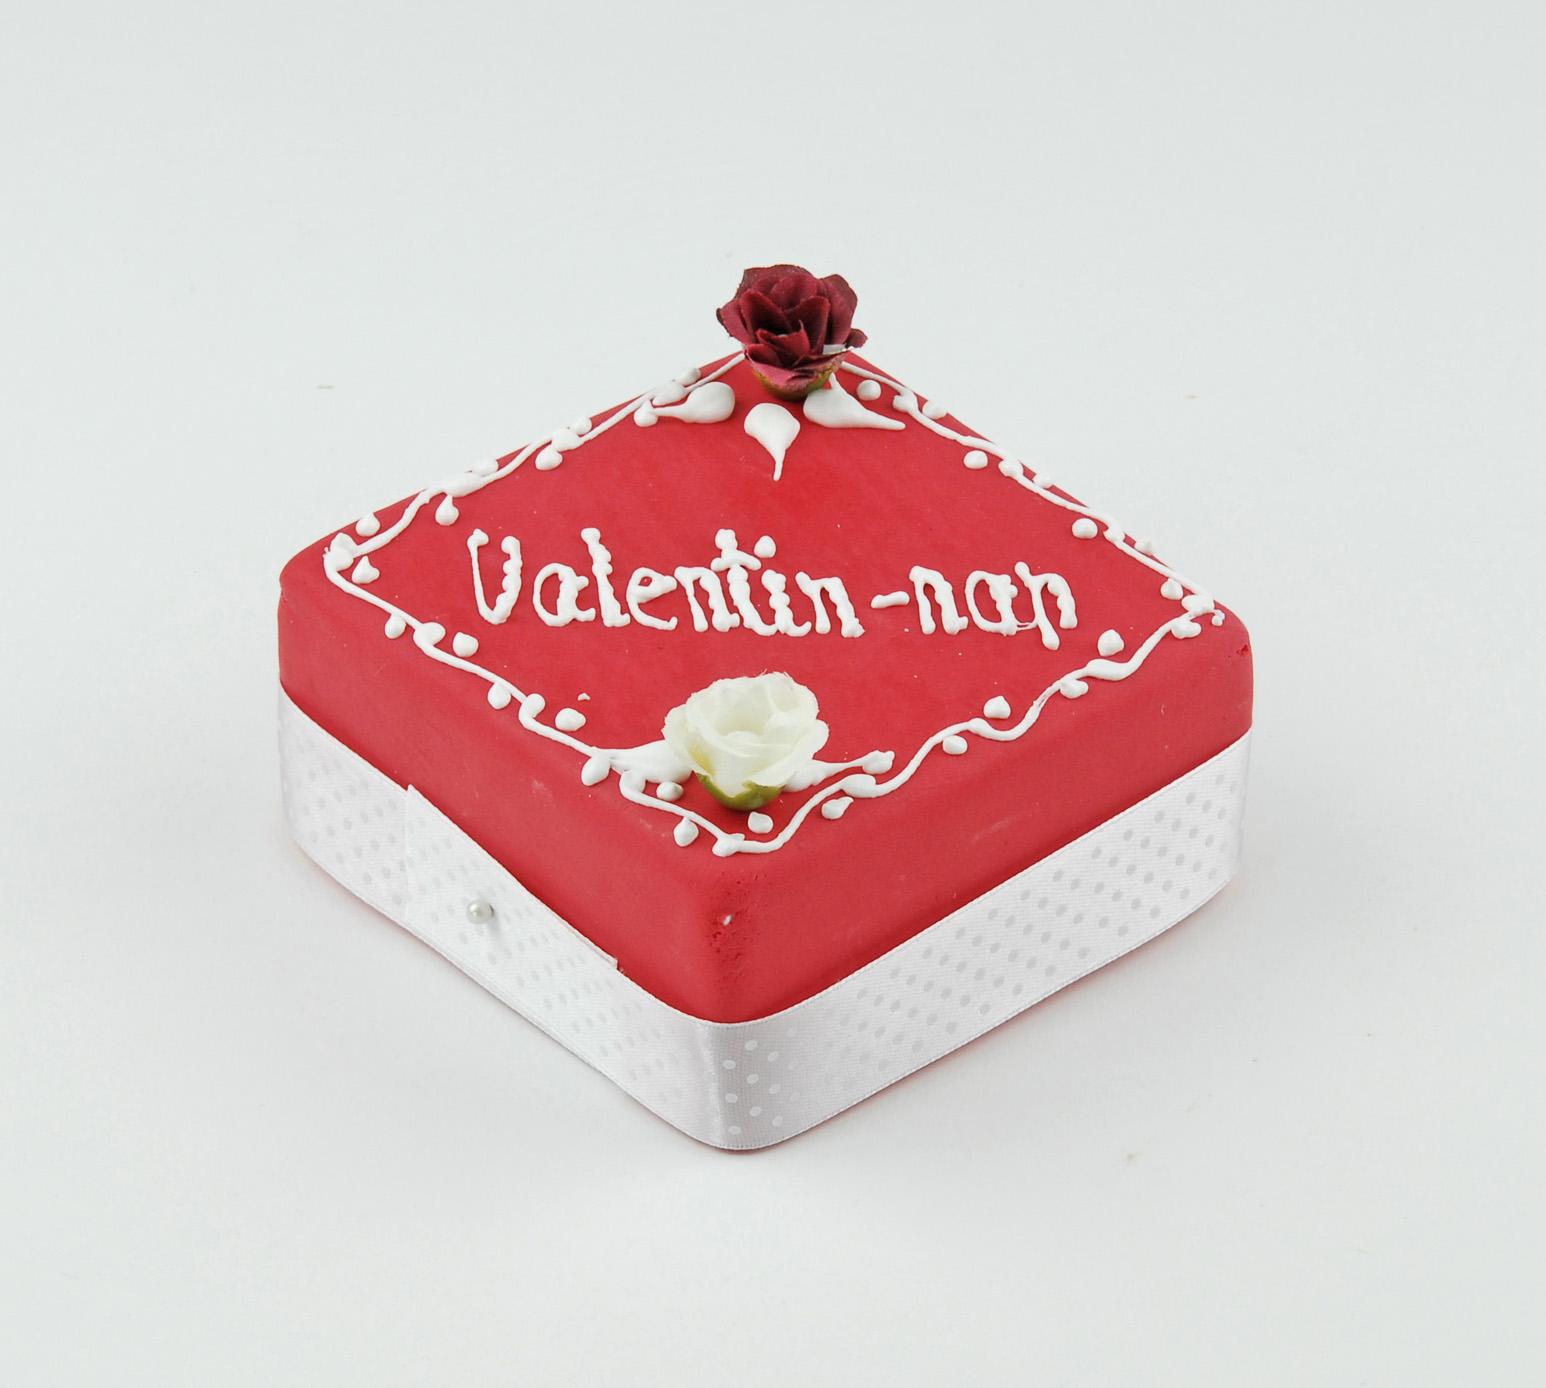 Valentin 2